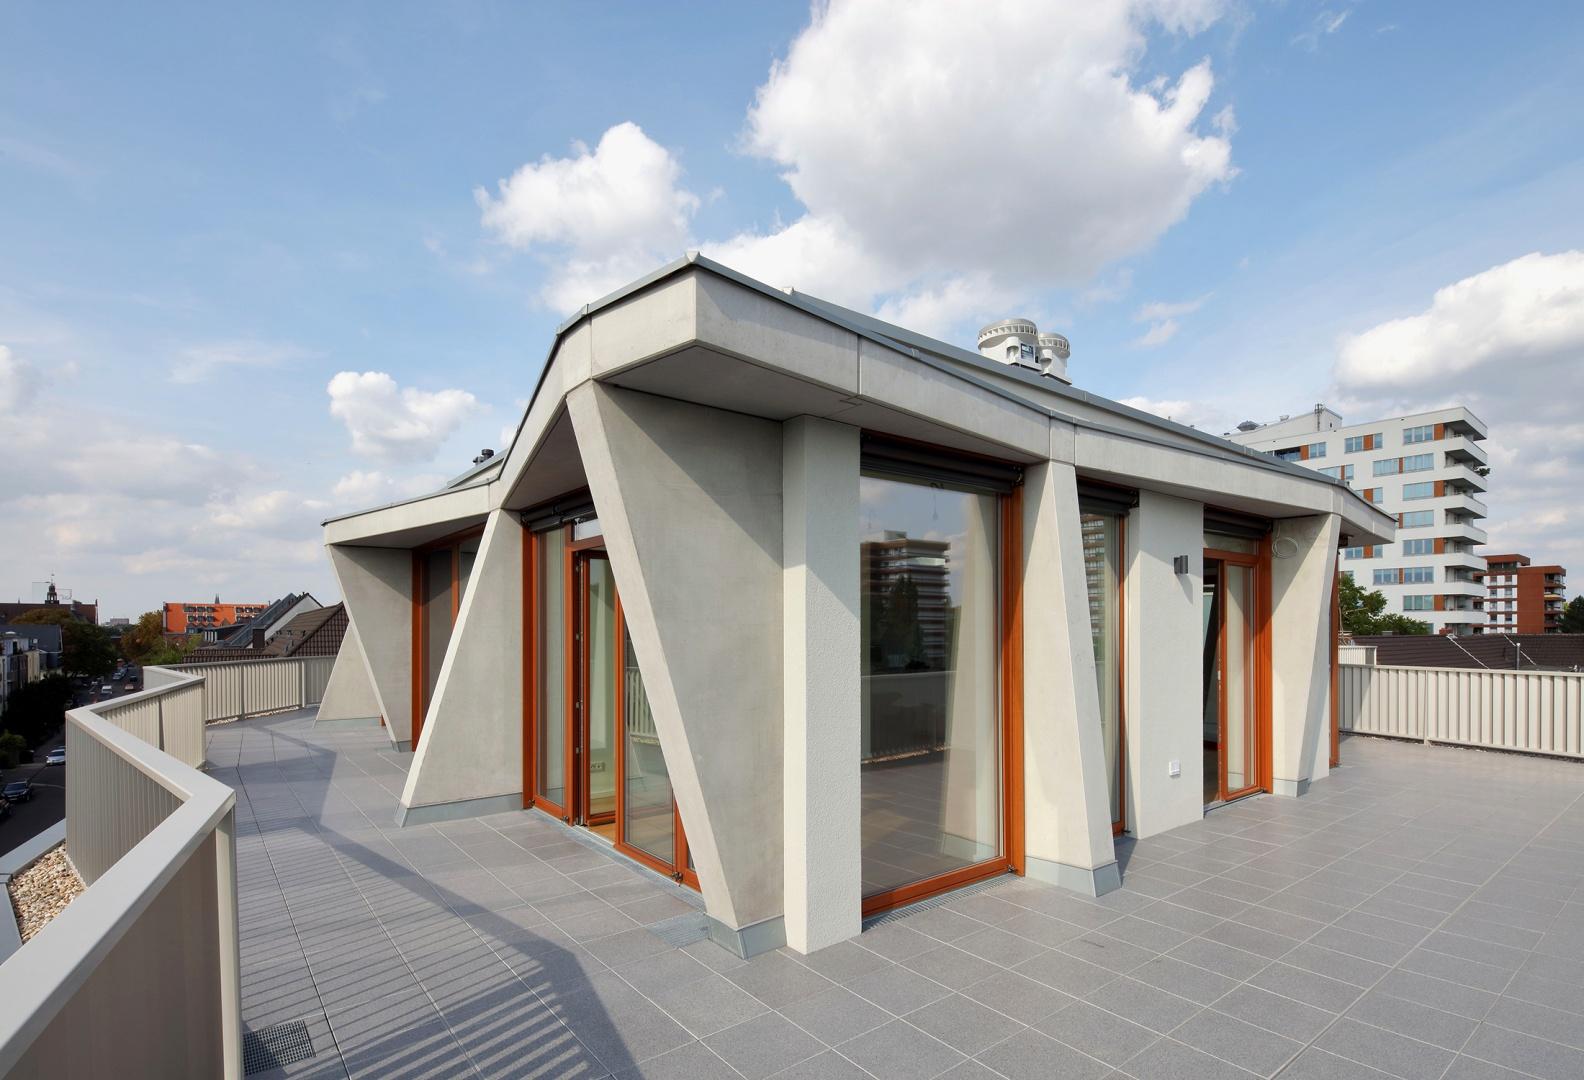 Dachgeschosswohnung an der Ecke Cäsarstrasse/Bernhardstrasse © Robert Mehl